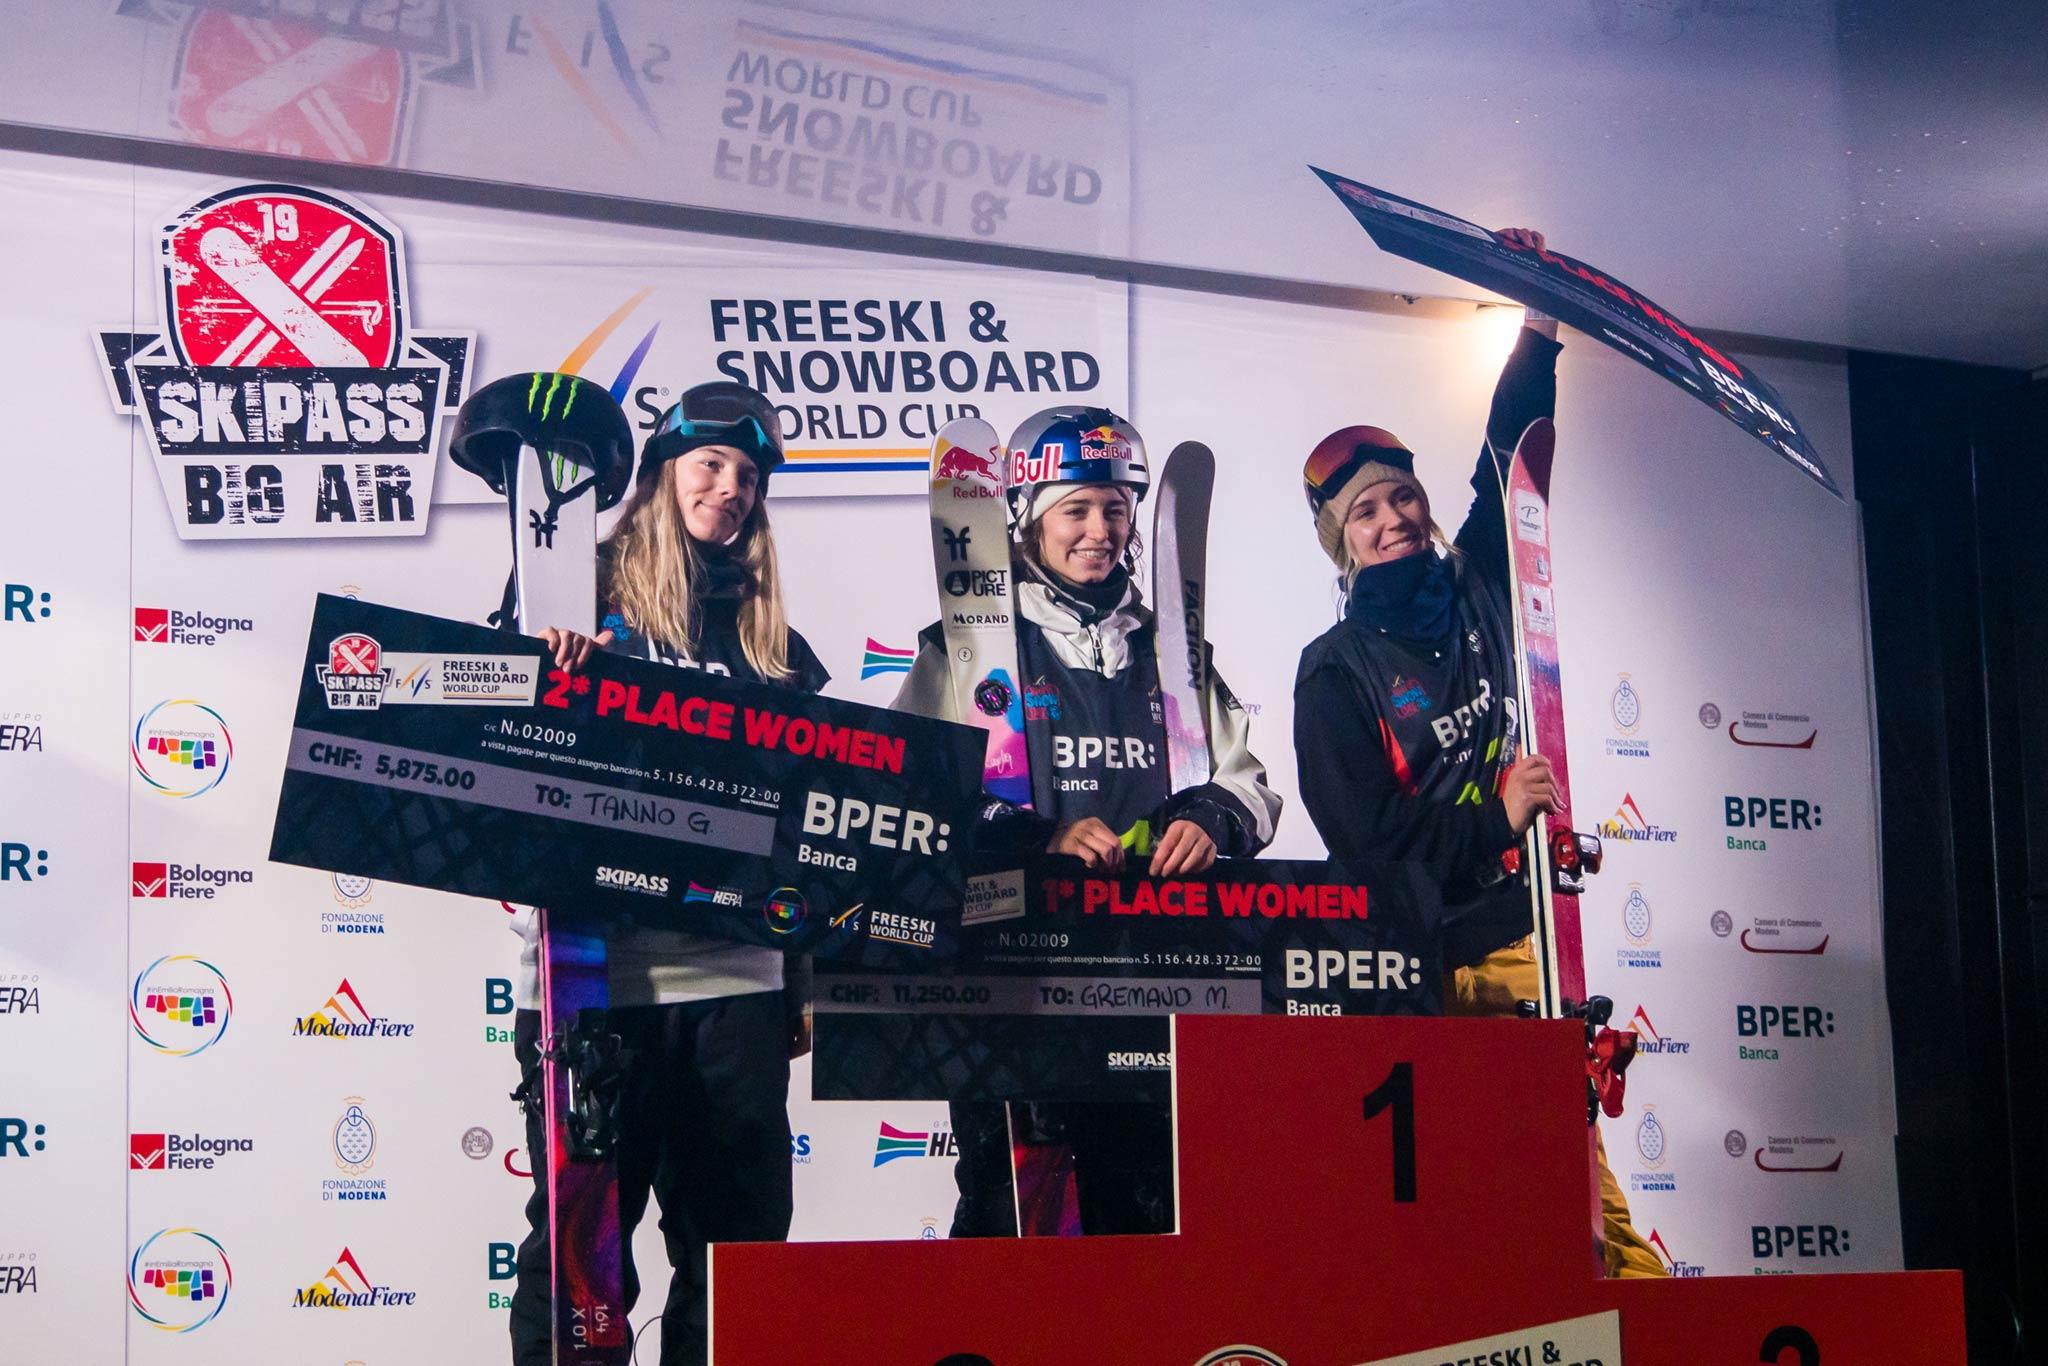 Die drei besten Frauen beim FIS Freeyle Big Air Contest in Modena, Italien (2019): Giulia Tanno (SUI), Mathilde Gremaud (SUI), Dara Howell (CAN)